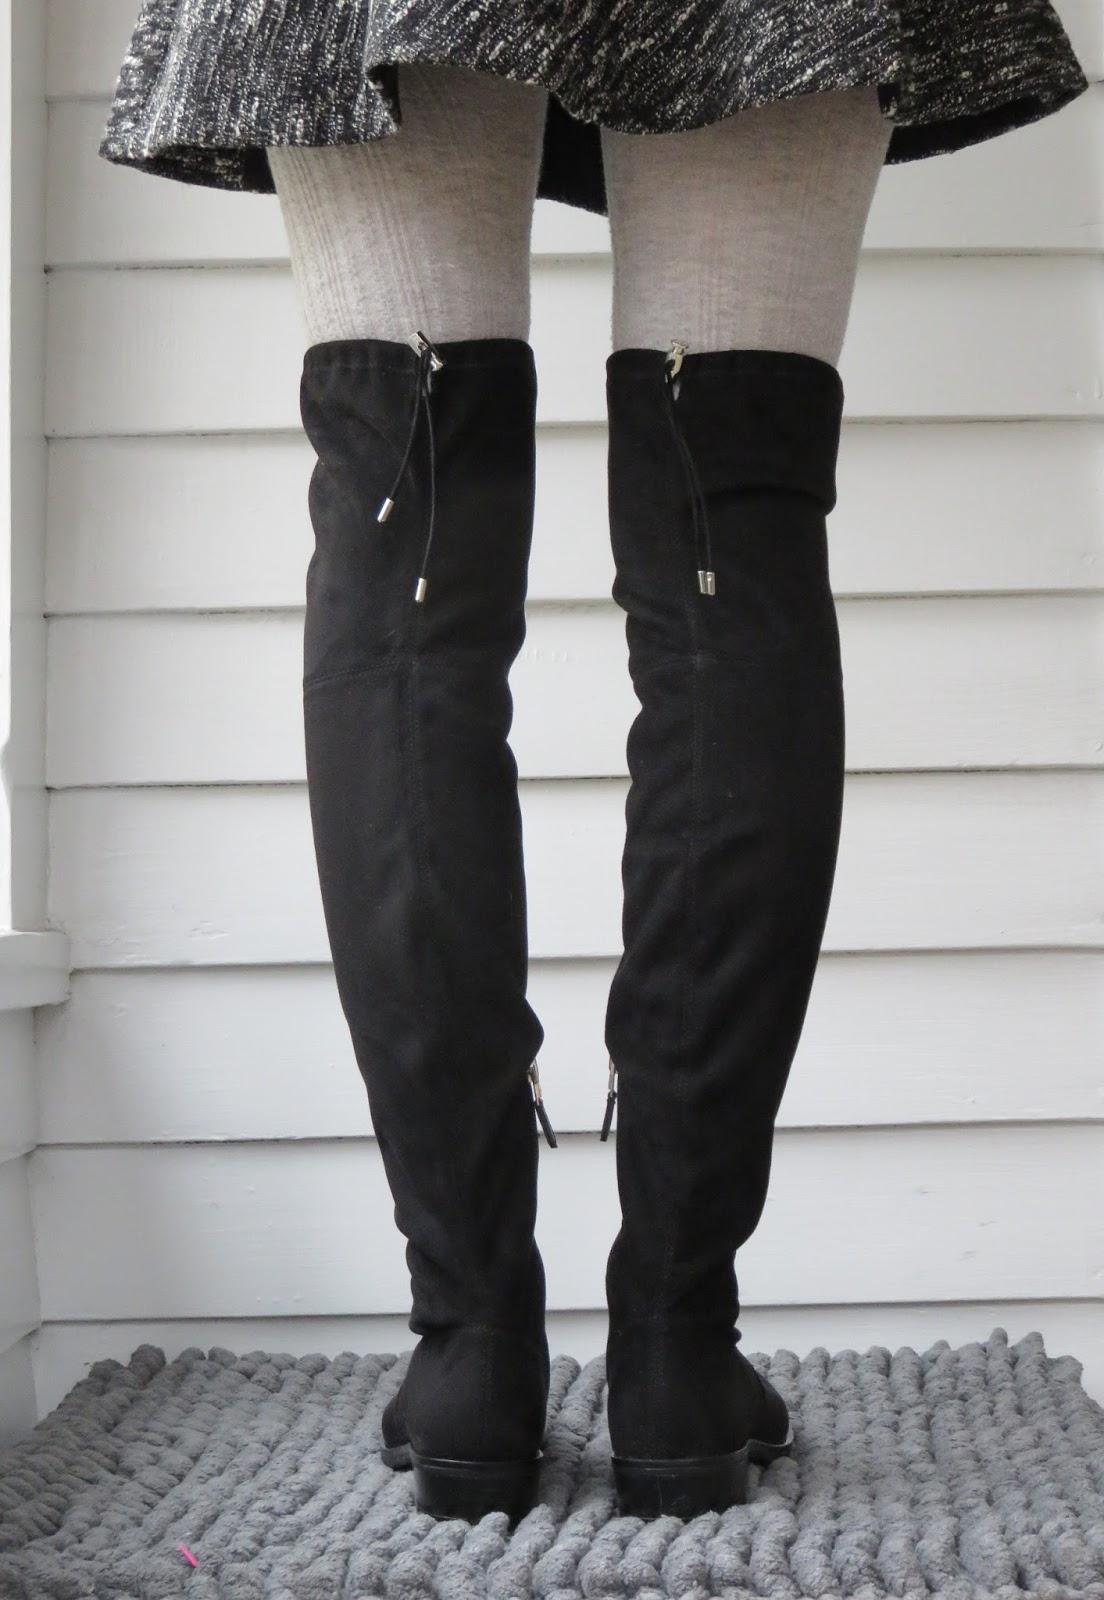 9b0111690dc Howdy Slim! Riding Boots for Thin Calves  Sam Edelman Paloma